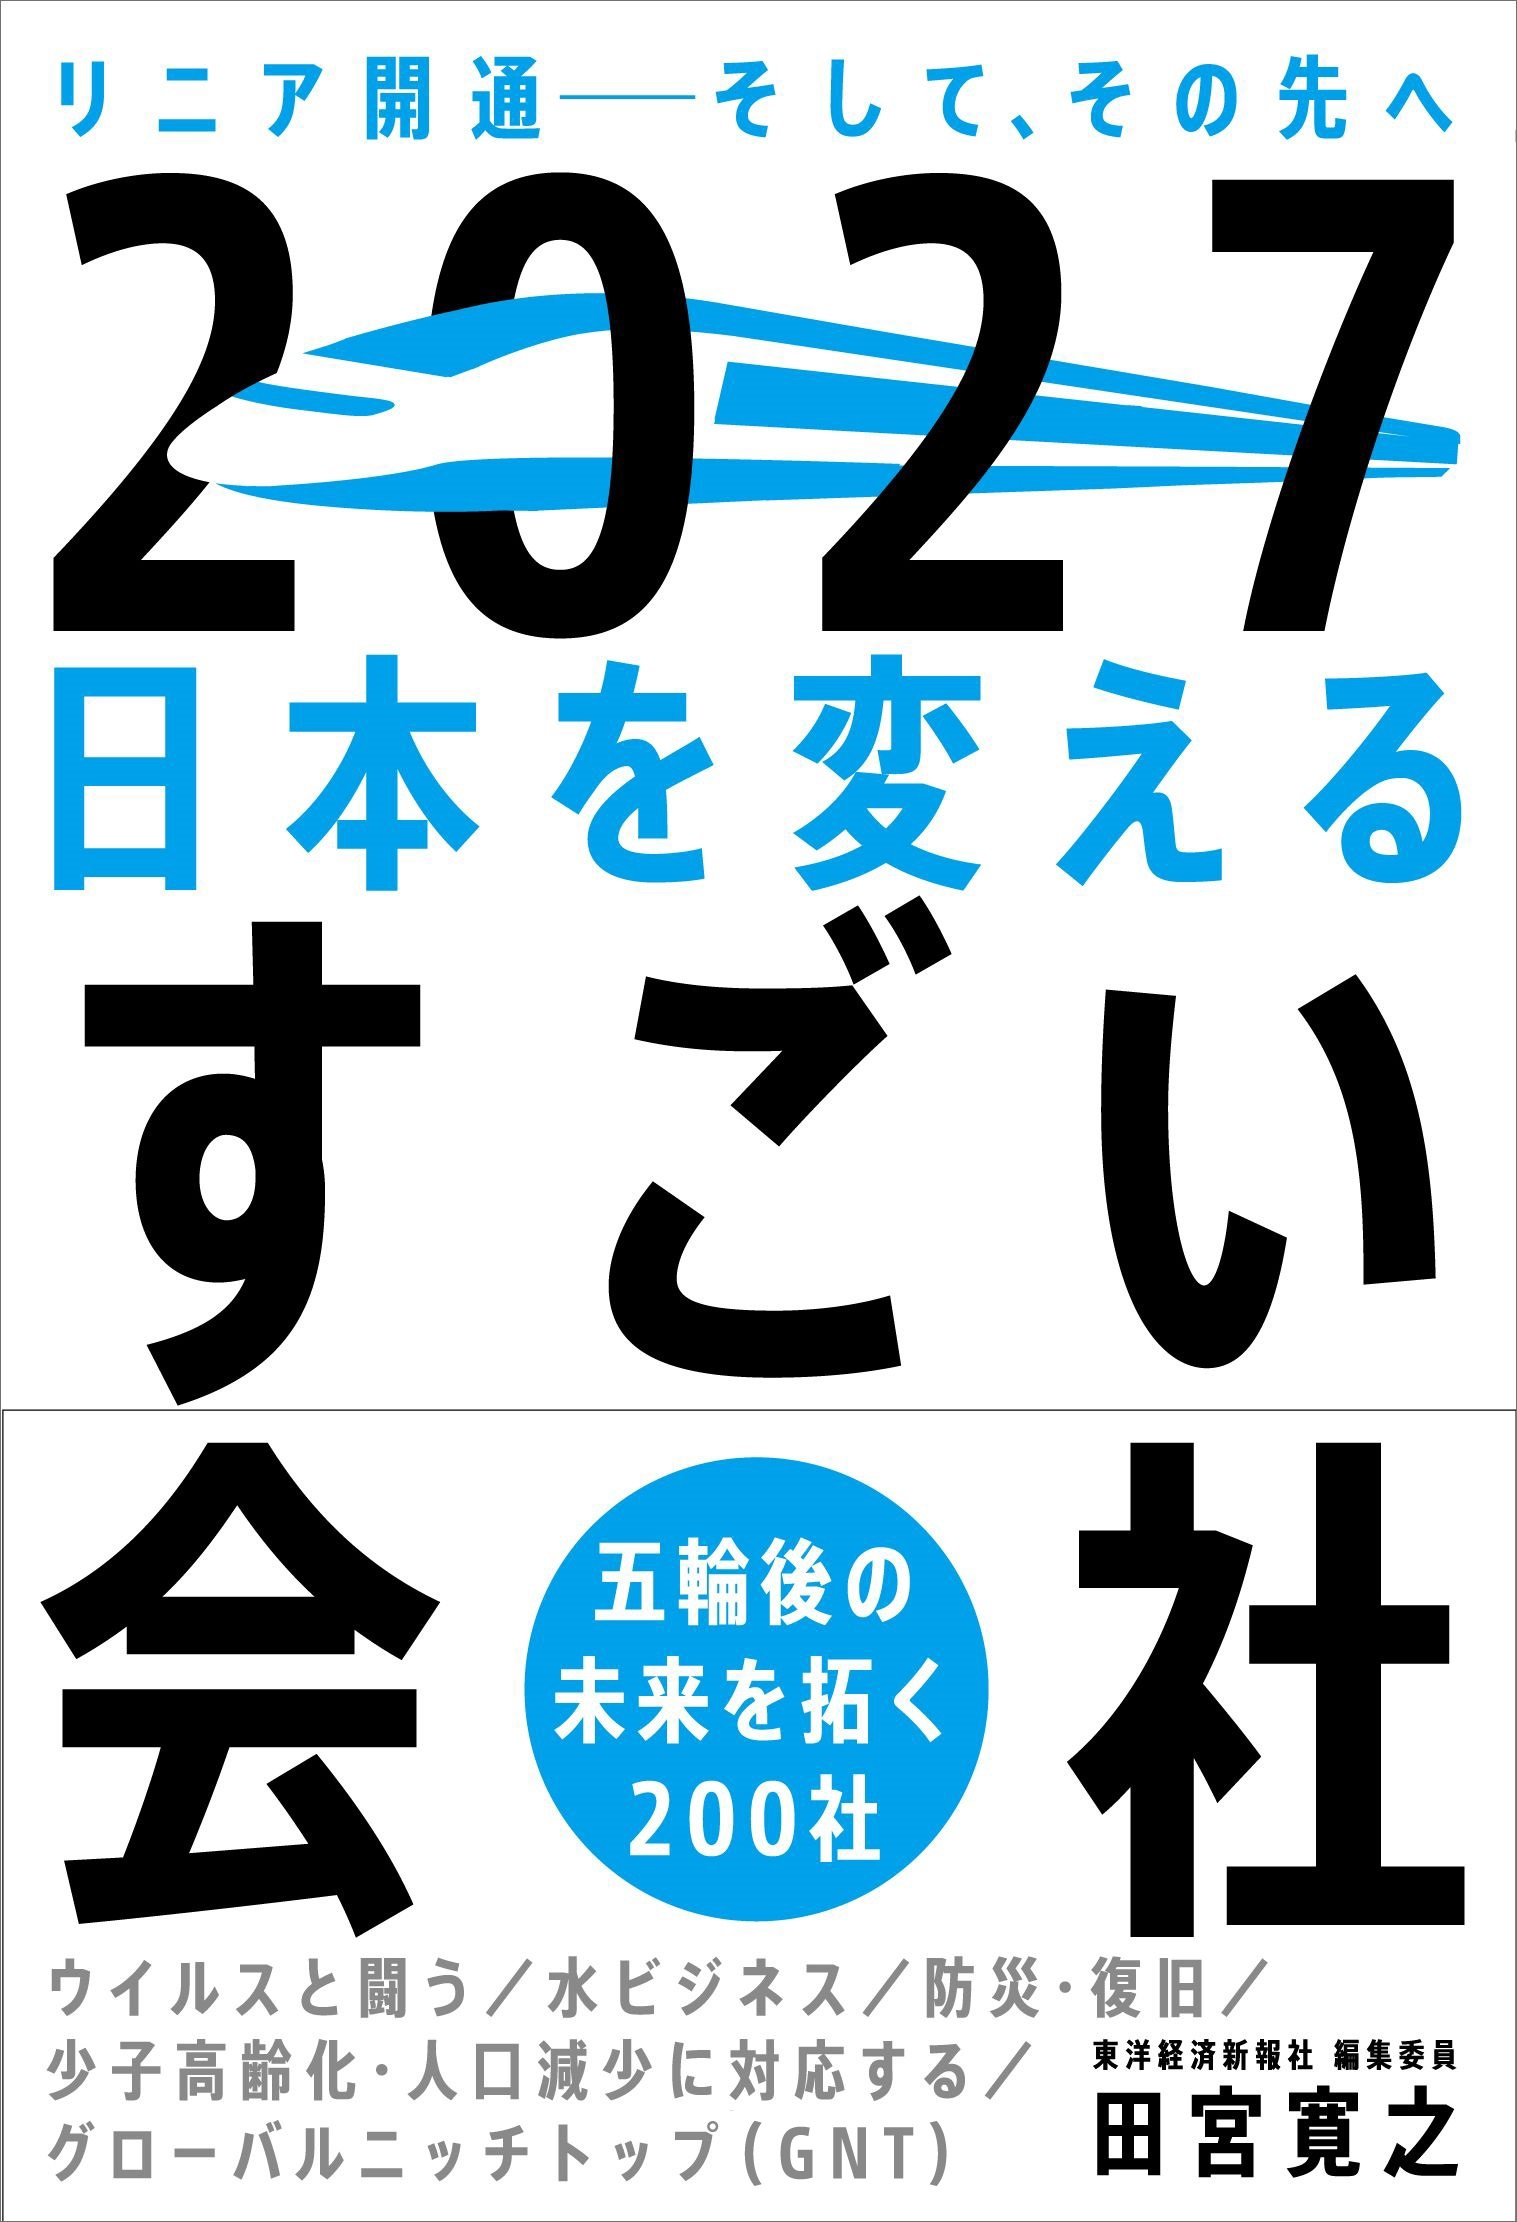 D21f00a5 a29a 4d72 9c07 2b9305091358 21/9/10:日本を変えるすごい会社